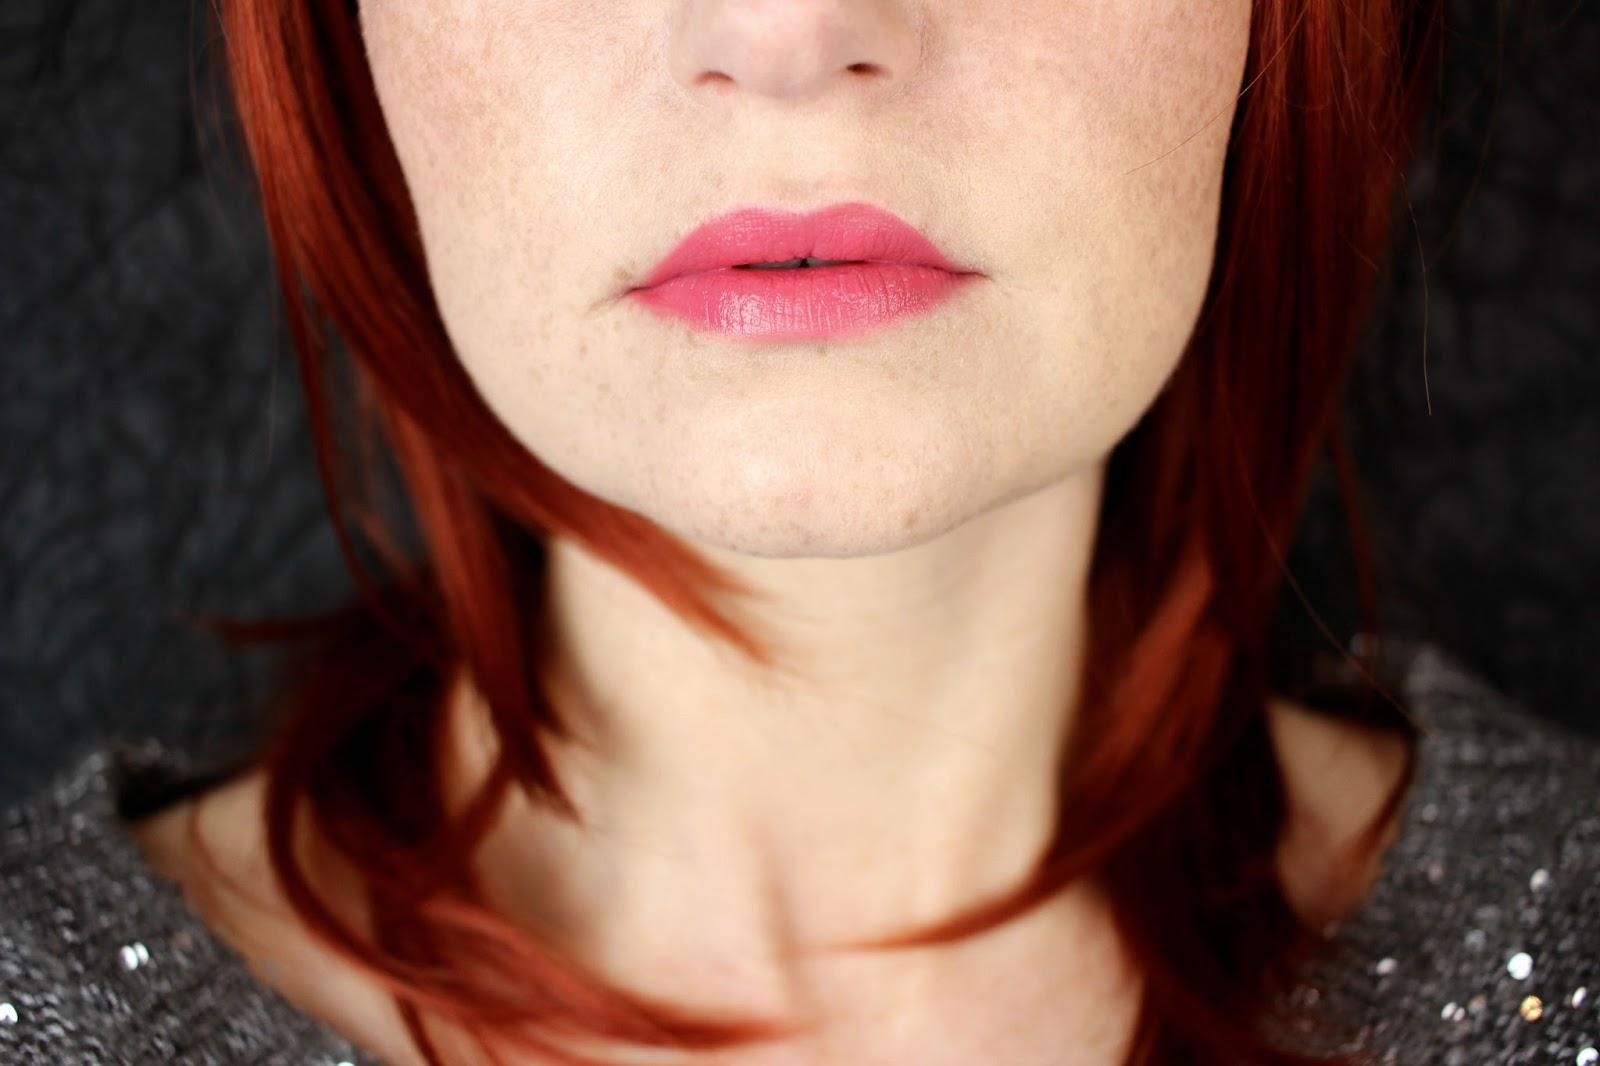 artdeco, blush, cosmetics, cremiger lippenstift, douglas, drogerie, farbtrends, fixing spray, lipgloss, Lippenpalette, lippenpinsel, lippenstift, most wanted lip palette, primer, review, rose, swatches, tragebilder,